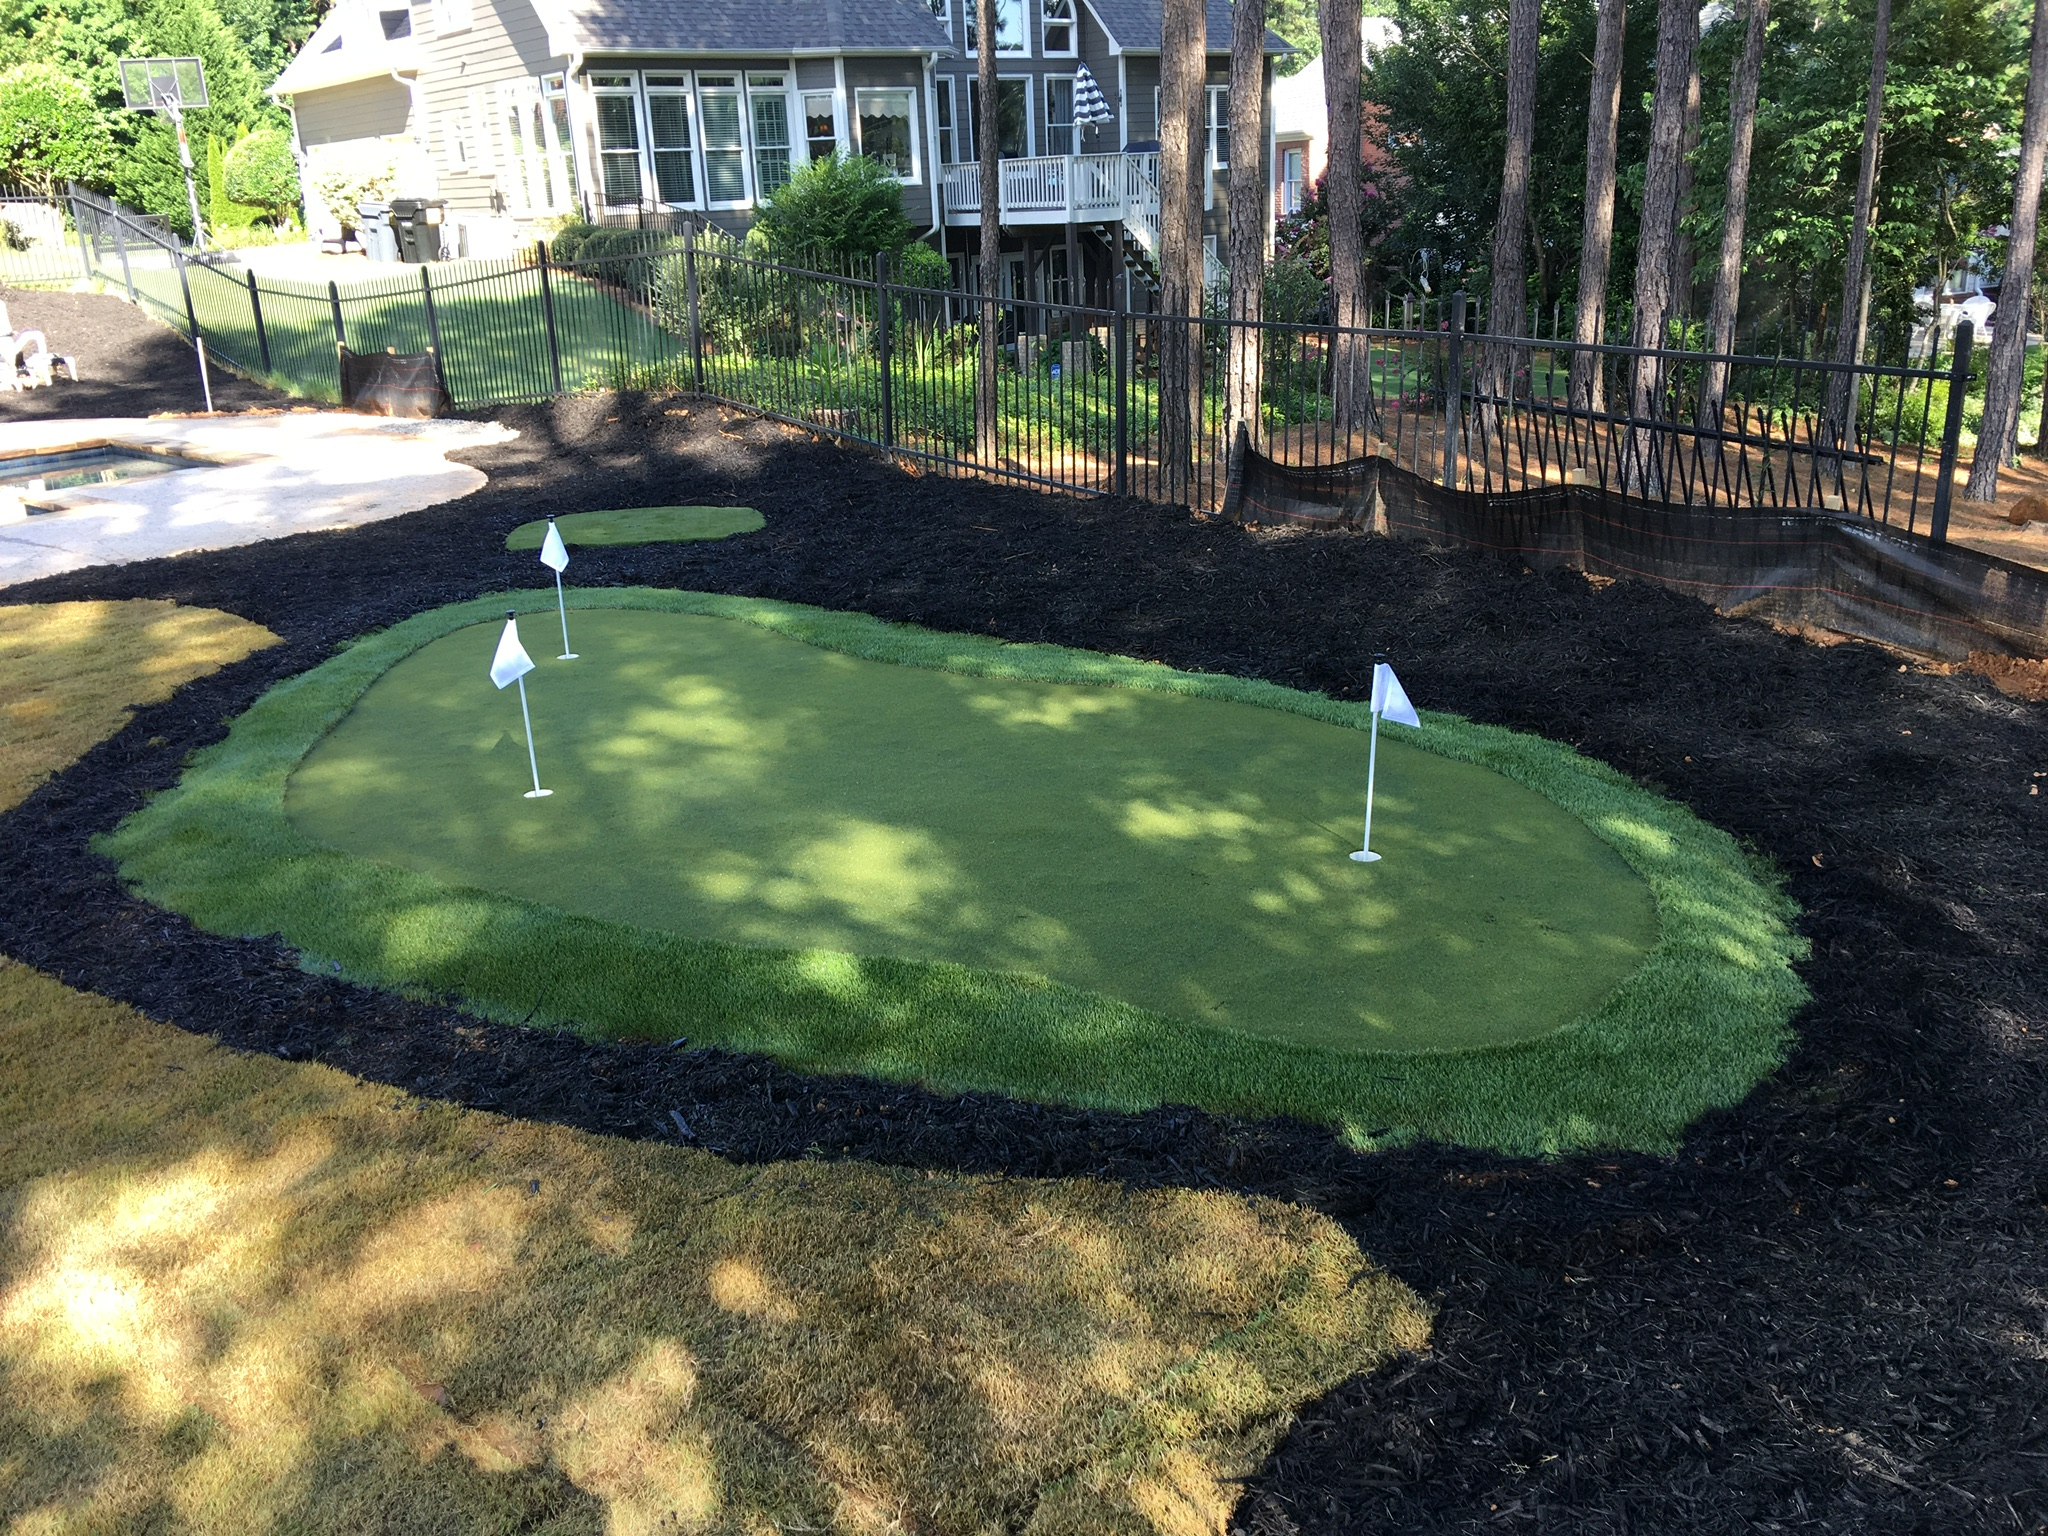 residential putting green backyard Indiana